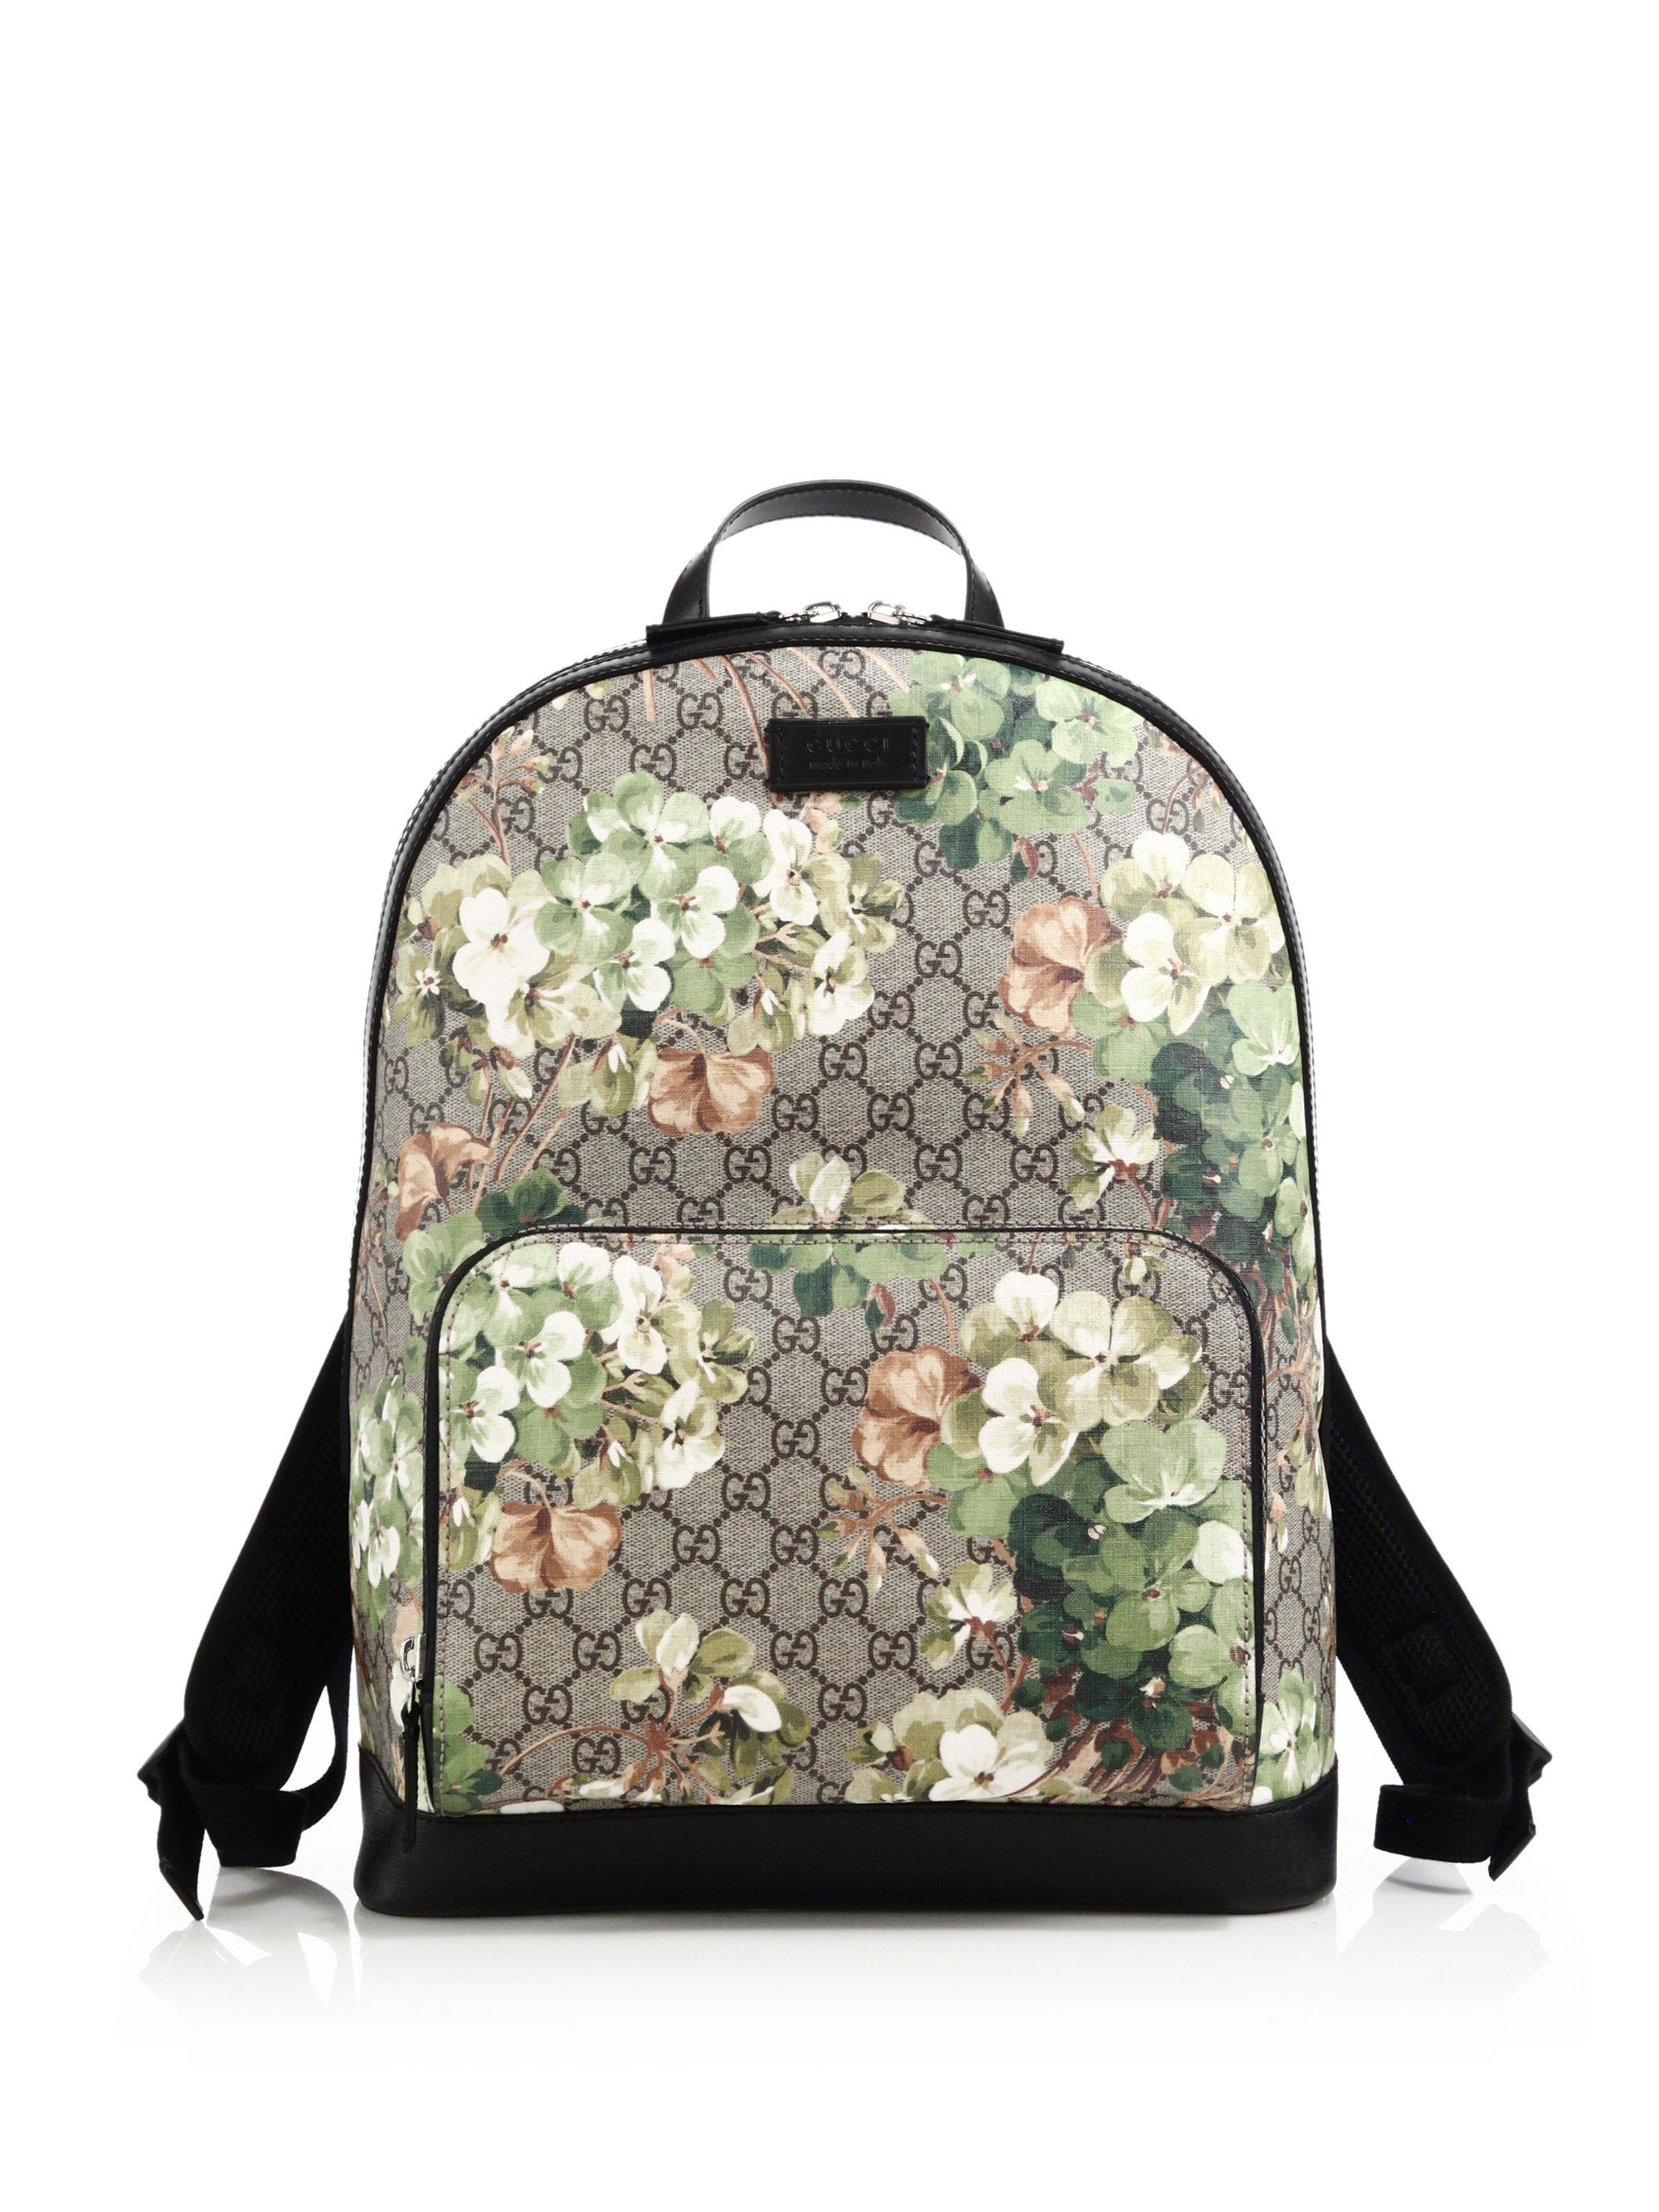 4a6b9d3e4332 Gucci Backpack Black Canvas- Fenix Toulouse Handball